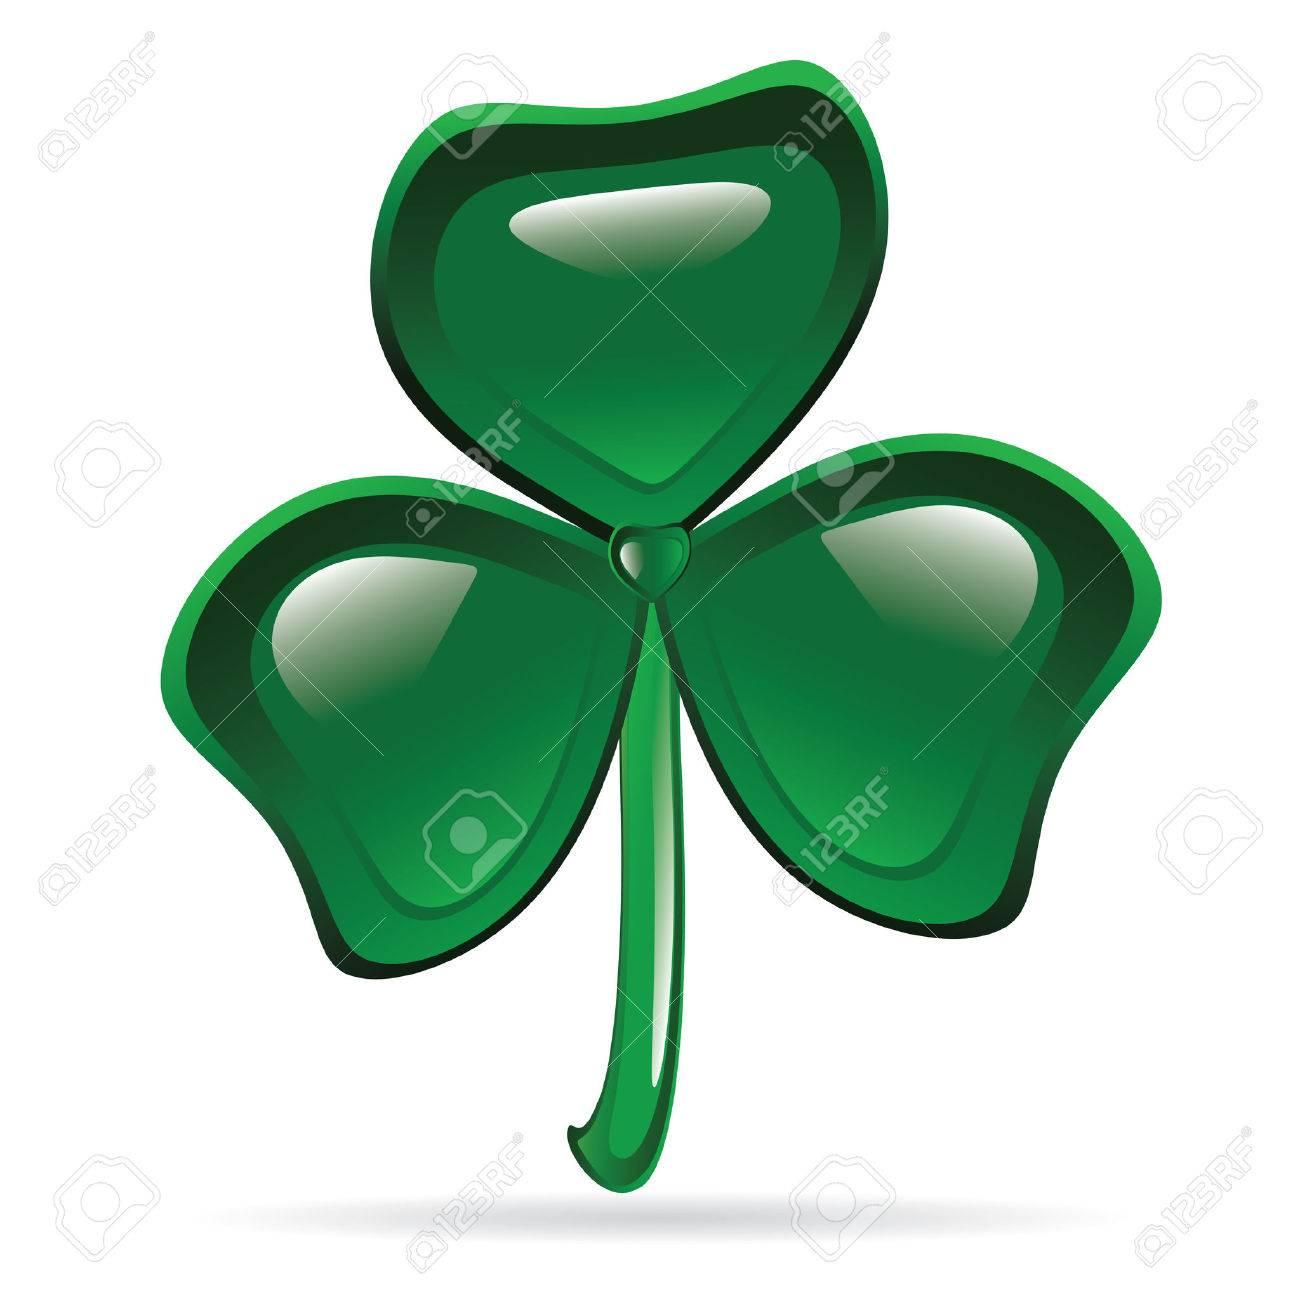 Abstract glossy shamrock. St. Patrick's Day illustration Stock Vector - 9043970